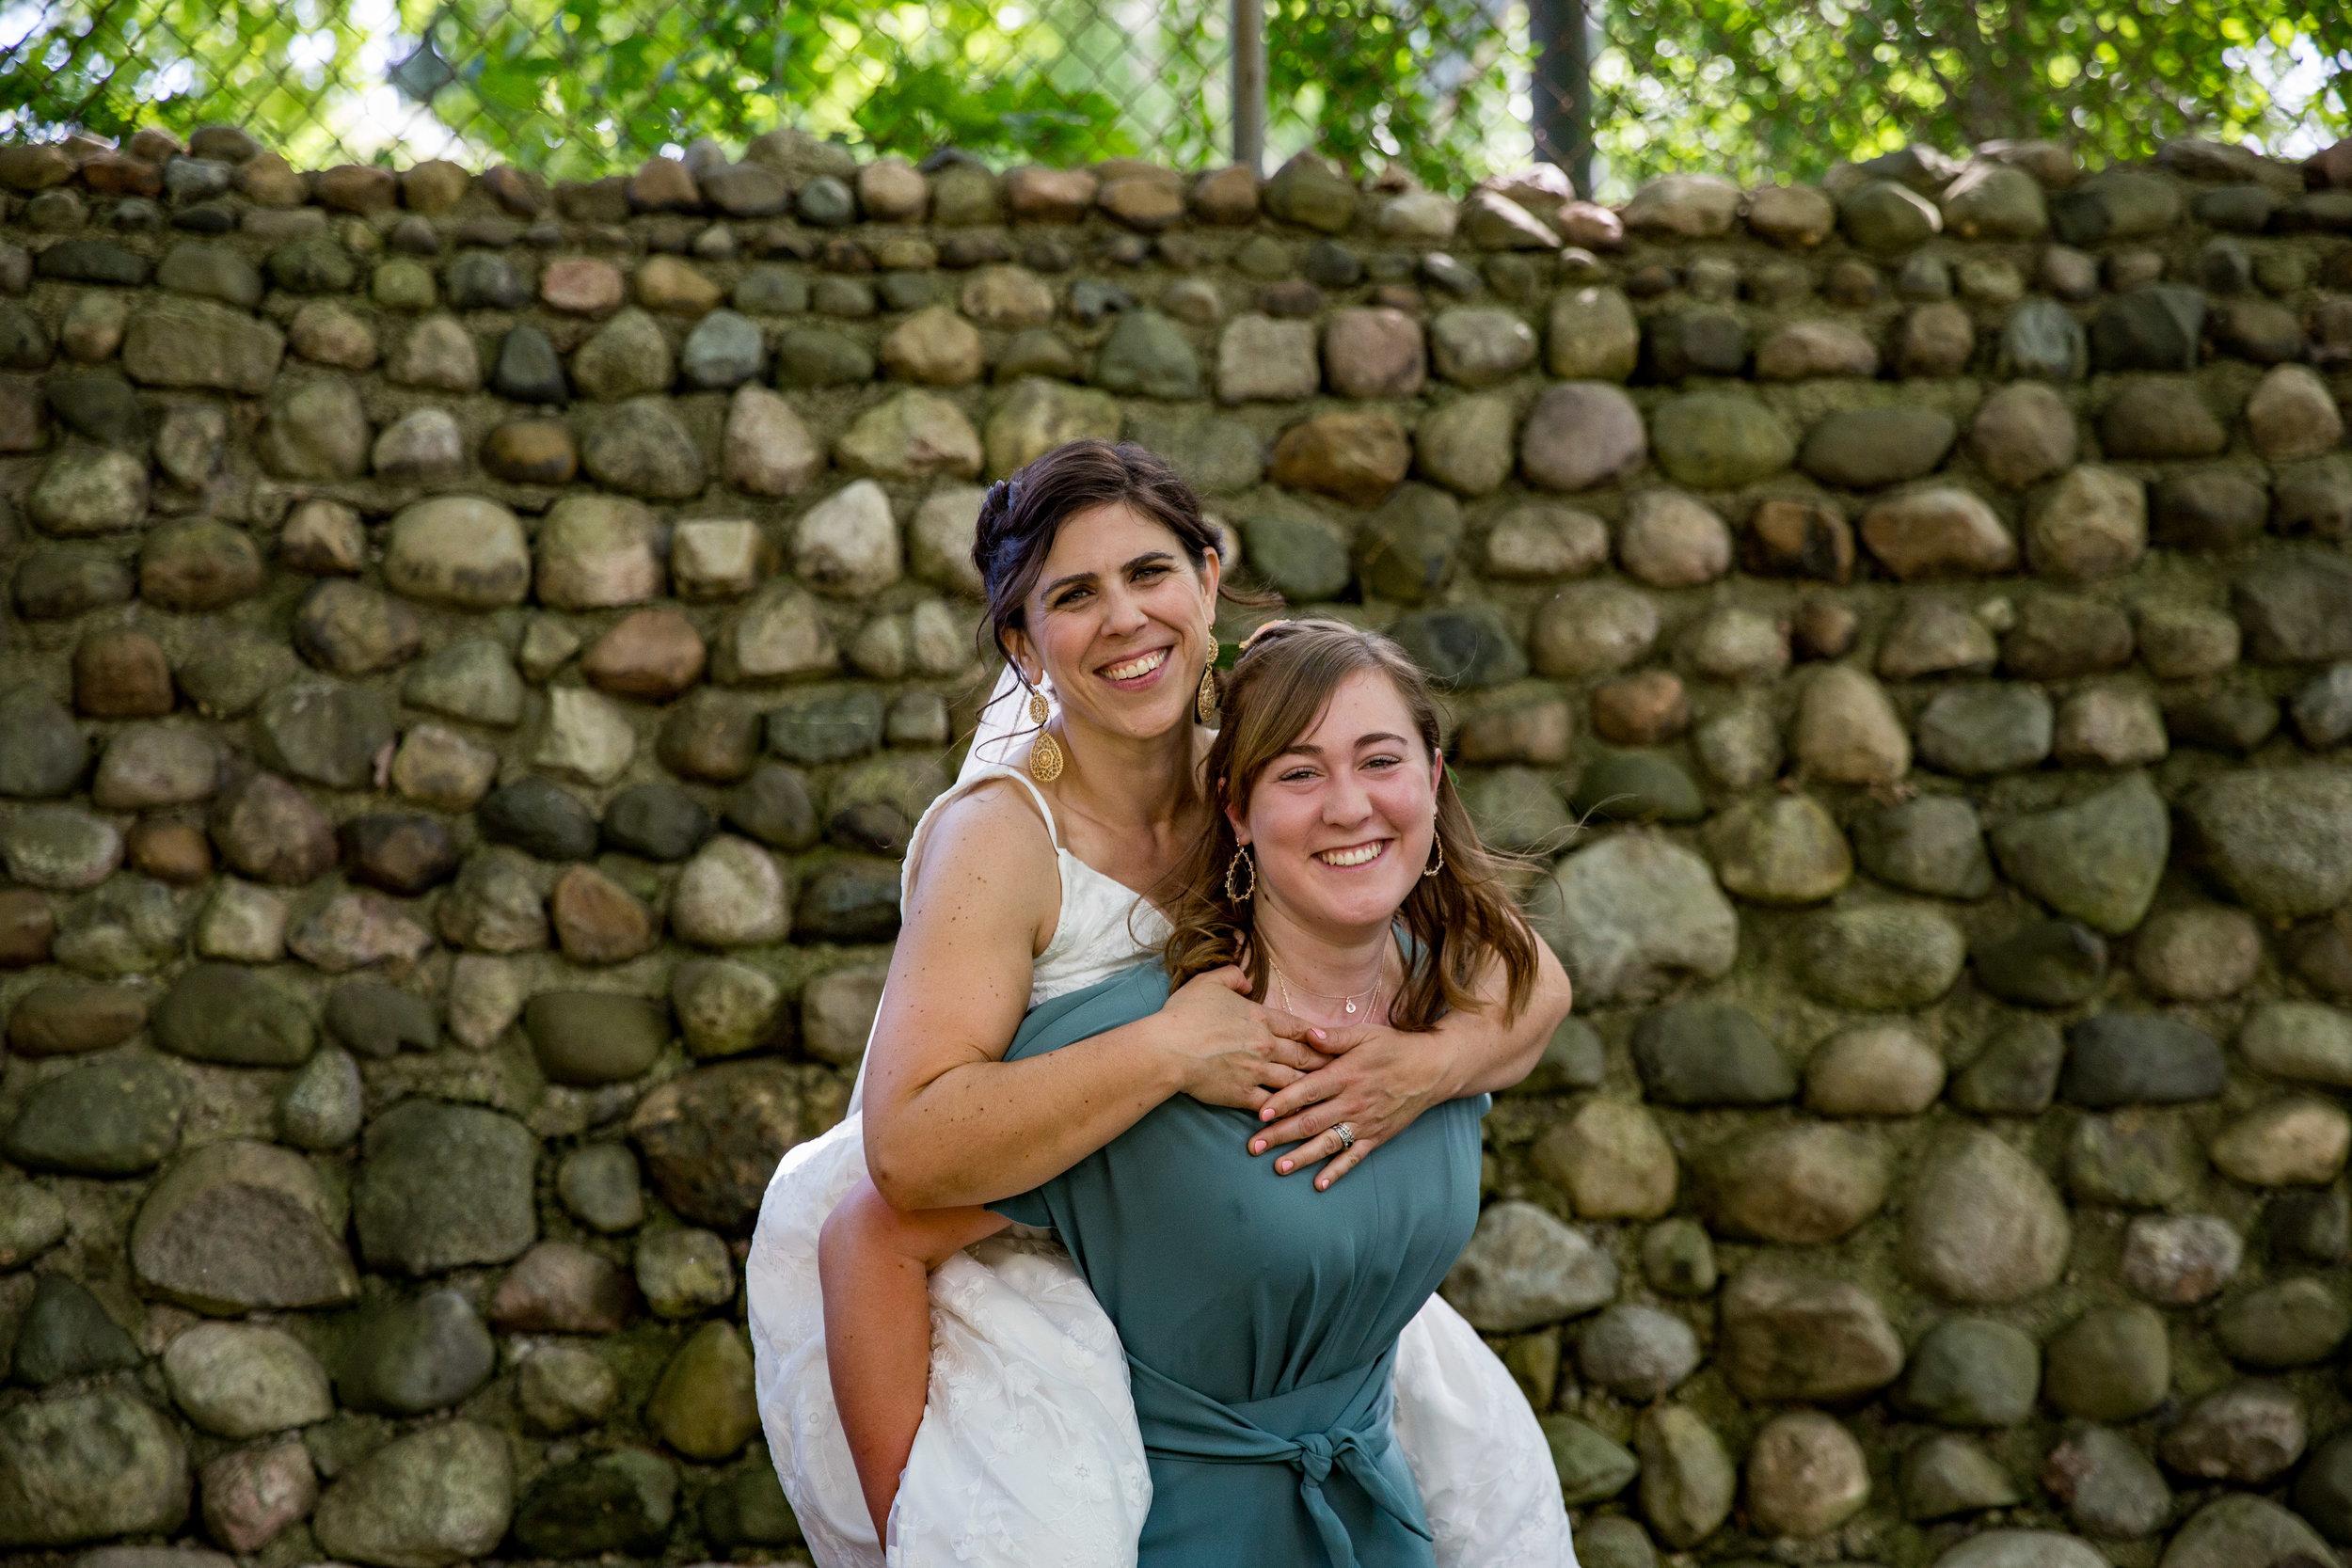 Natalie and Dallas Mooney Wedding 6-8-19_Tania Watt Photography-359.jpg